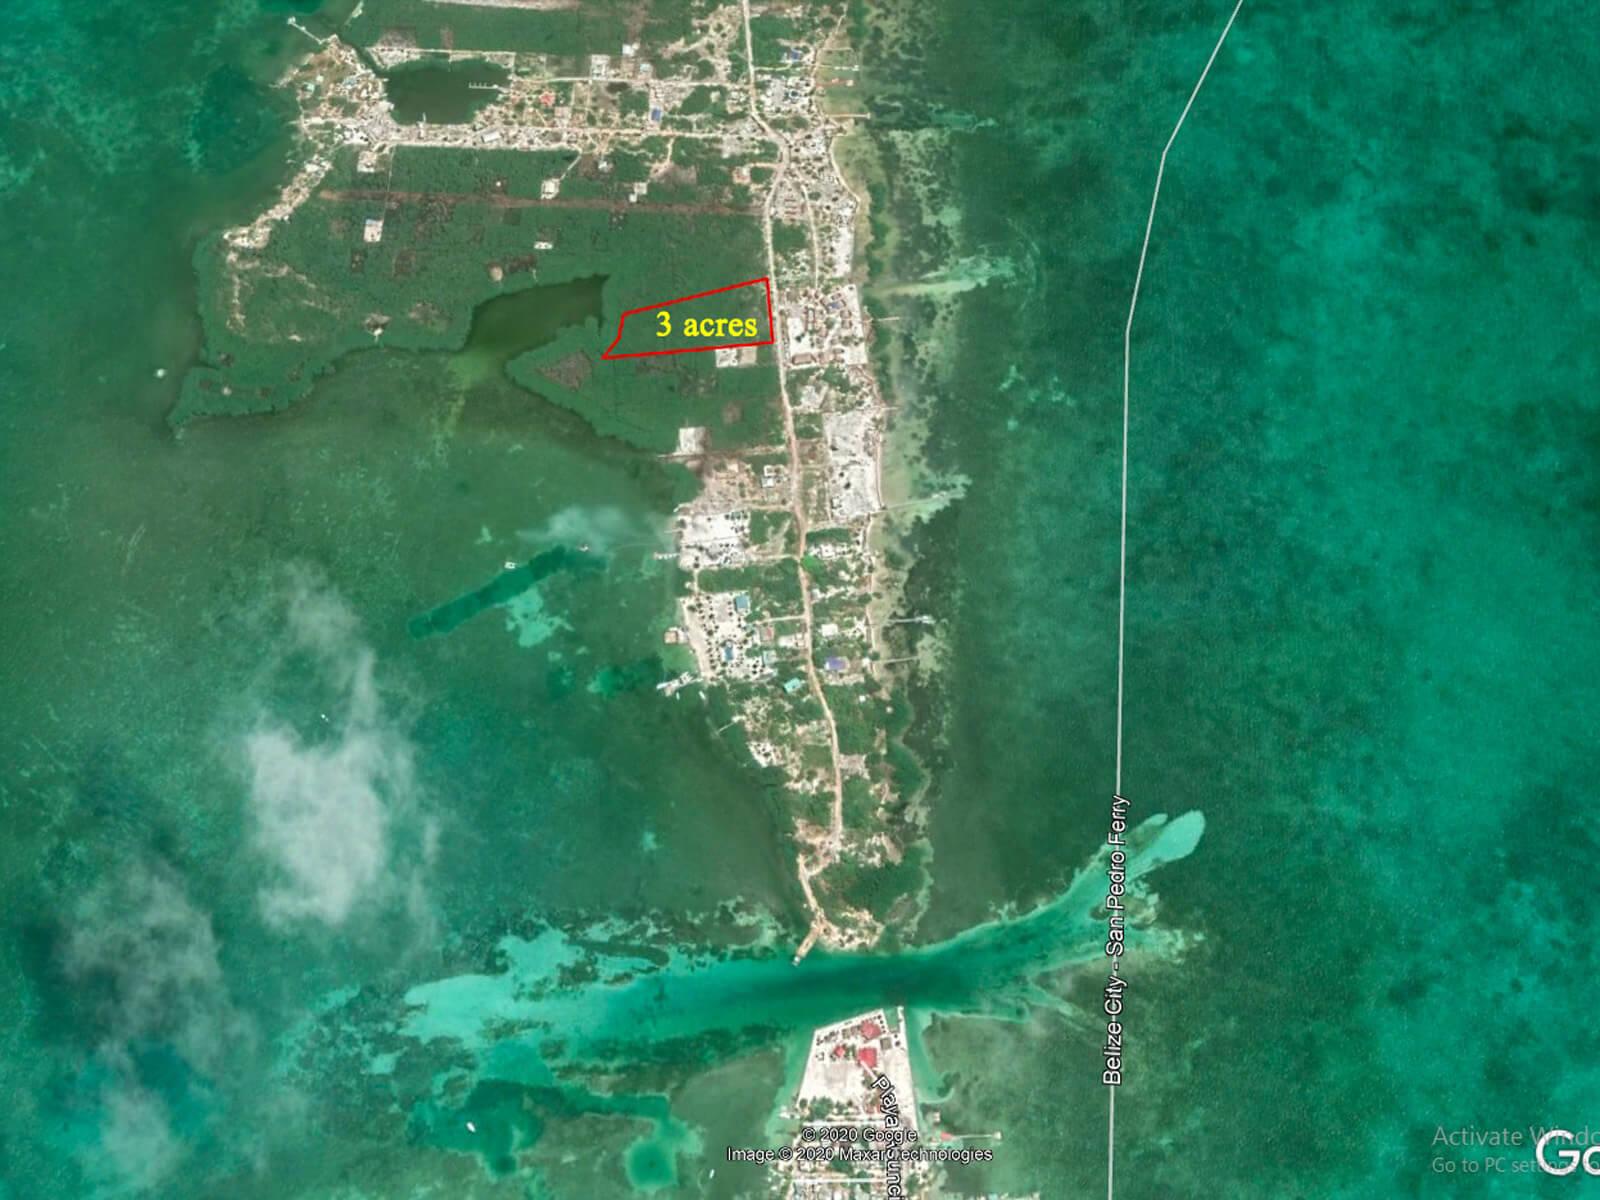 3 Acres of Prime Commercial Land for Sale in Caye Caulker